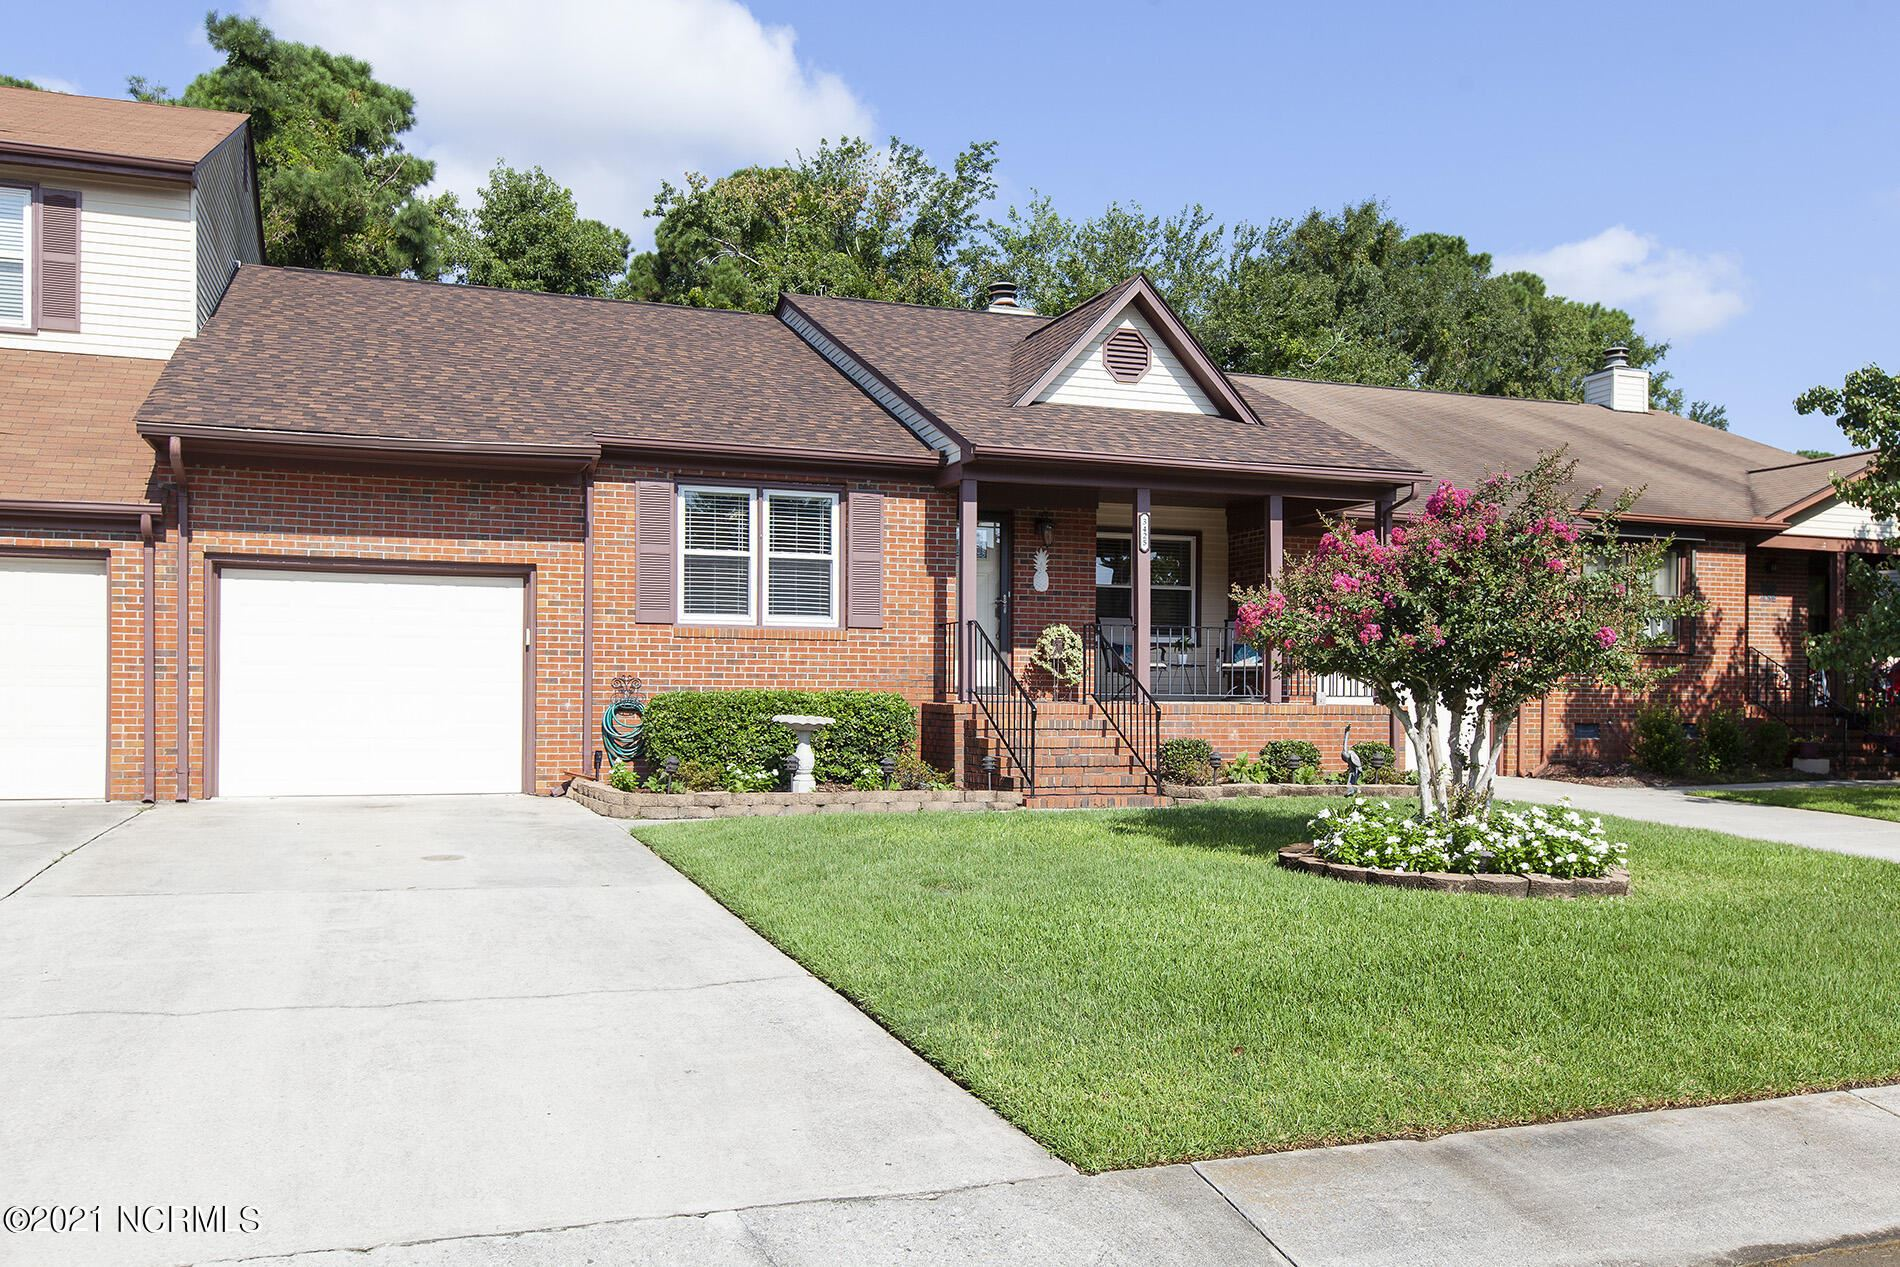 Photo of 3425 Regency Drive, Wilmington, NC 28412 (MLS # 100284952)